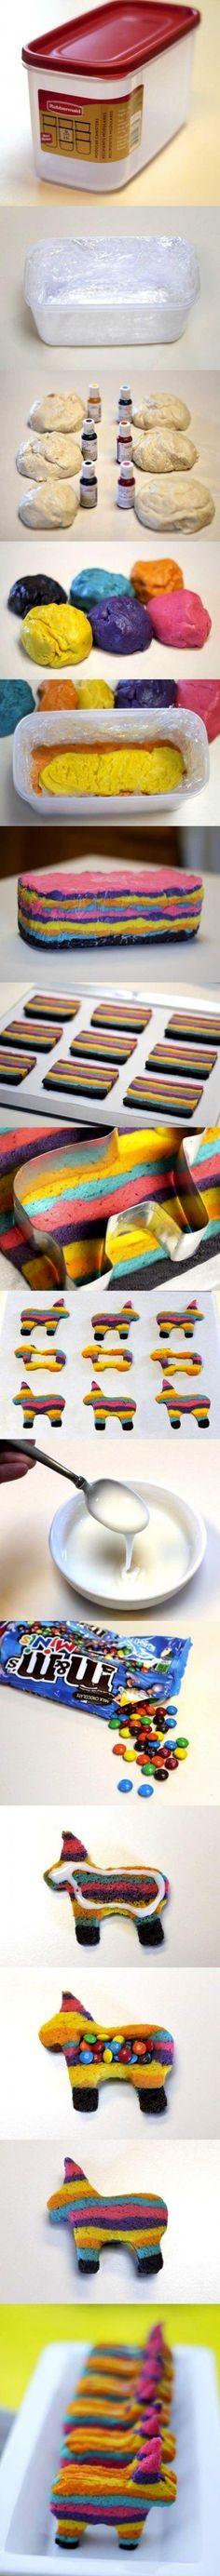 Piñata Cookies - Win Bild - Webfail